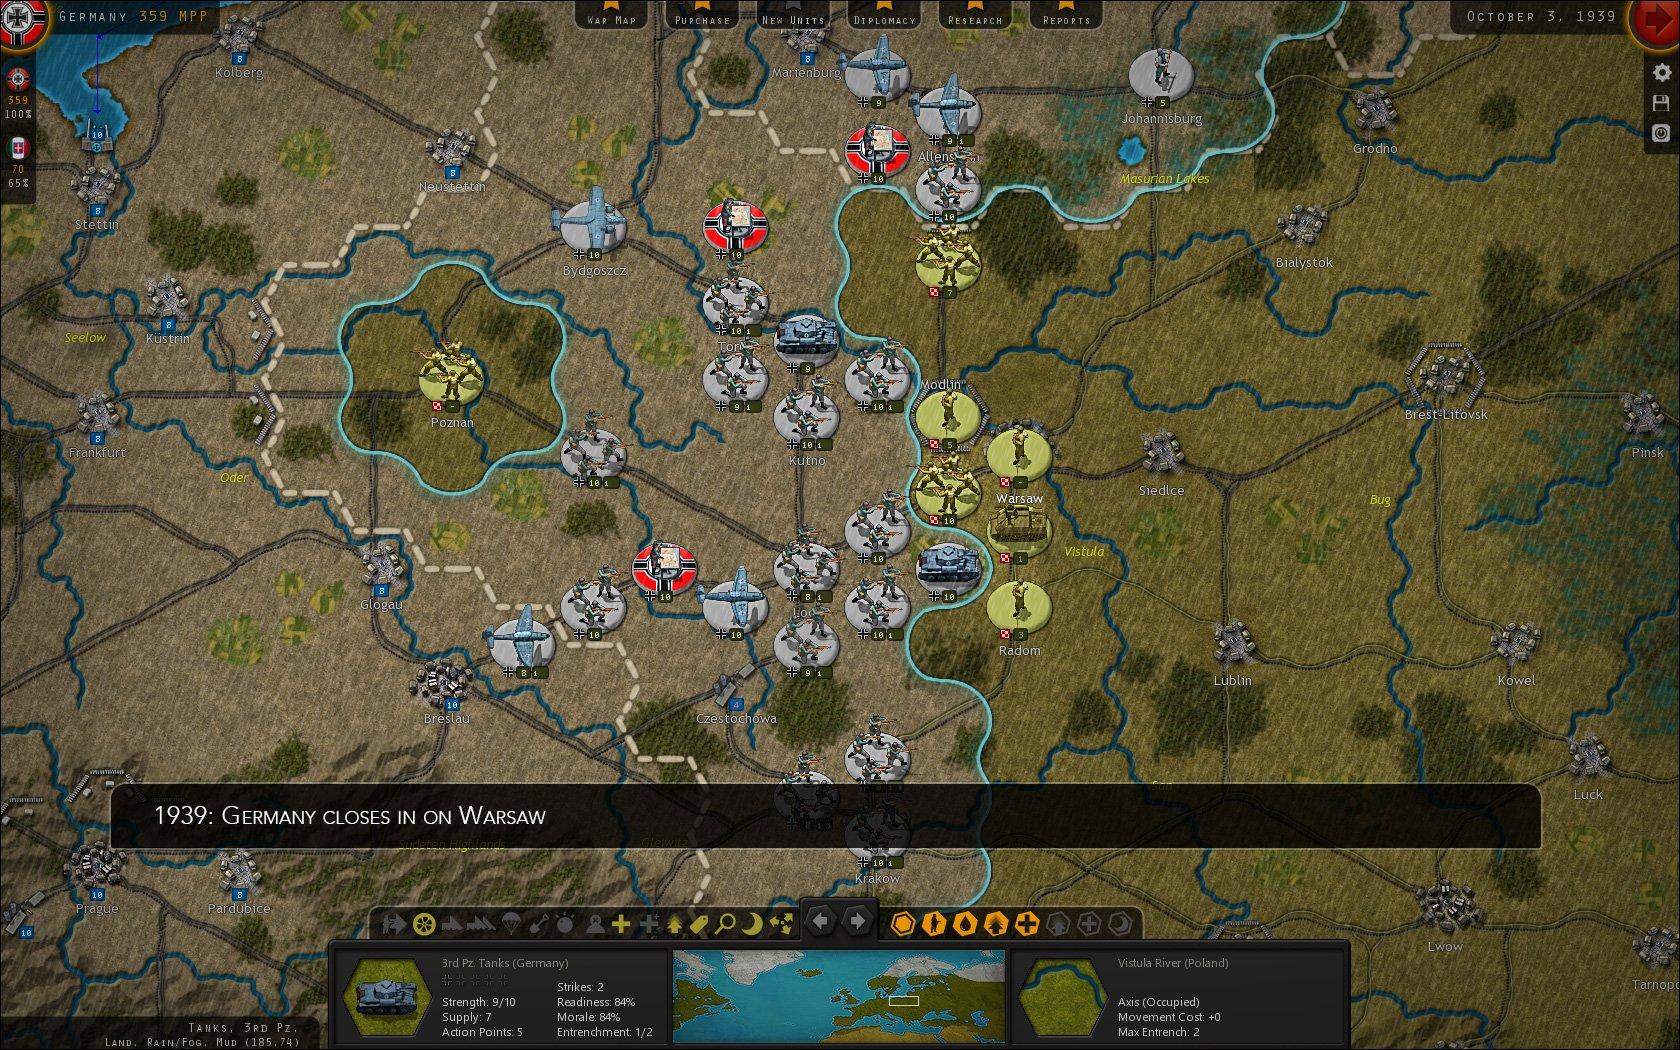 Amazon.com: Strategic Command WWII: War in Europe: Video Games